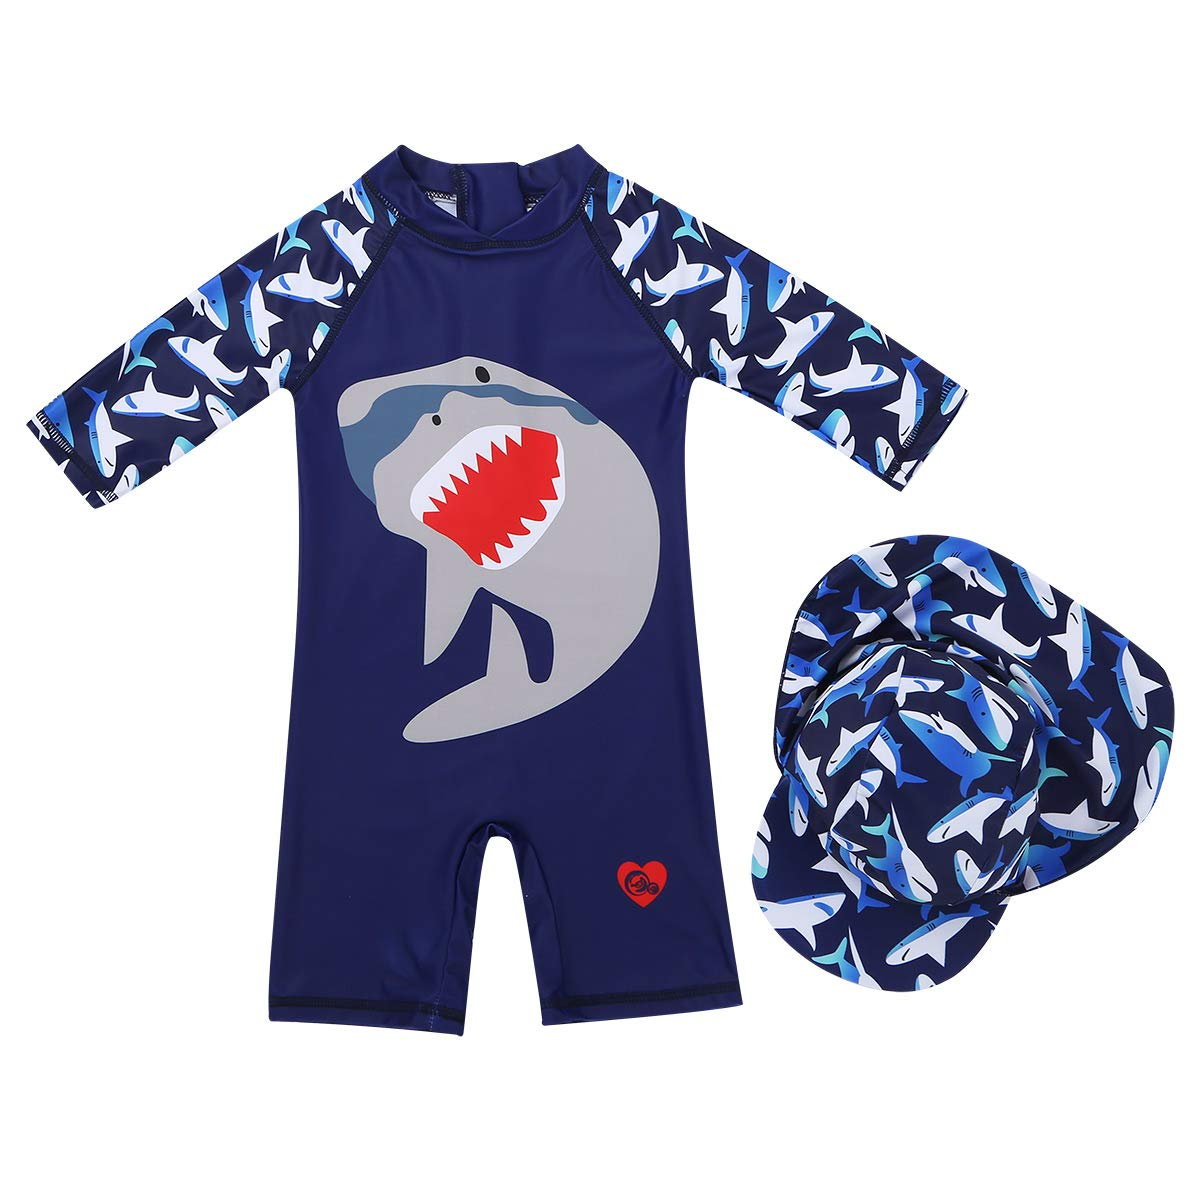 MSemis Toddler Baby Boys Shark One-Piece Zipper Swimsuit Bathing Suit Rash Guard Shirt with Hat Surfing Swim Costume